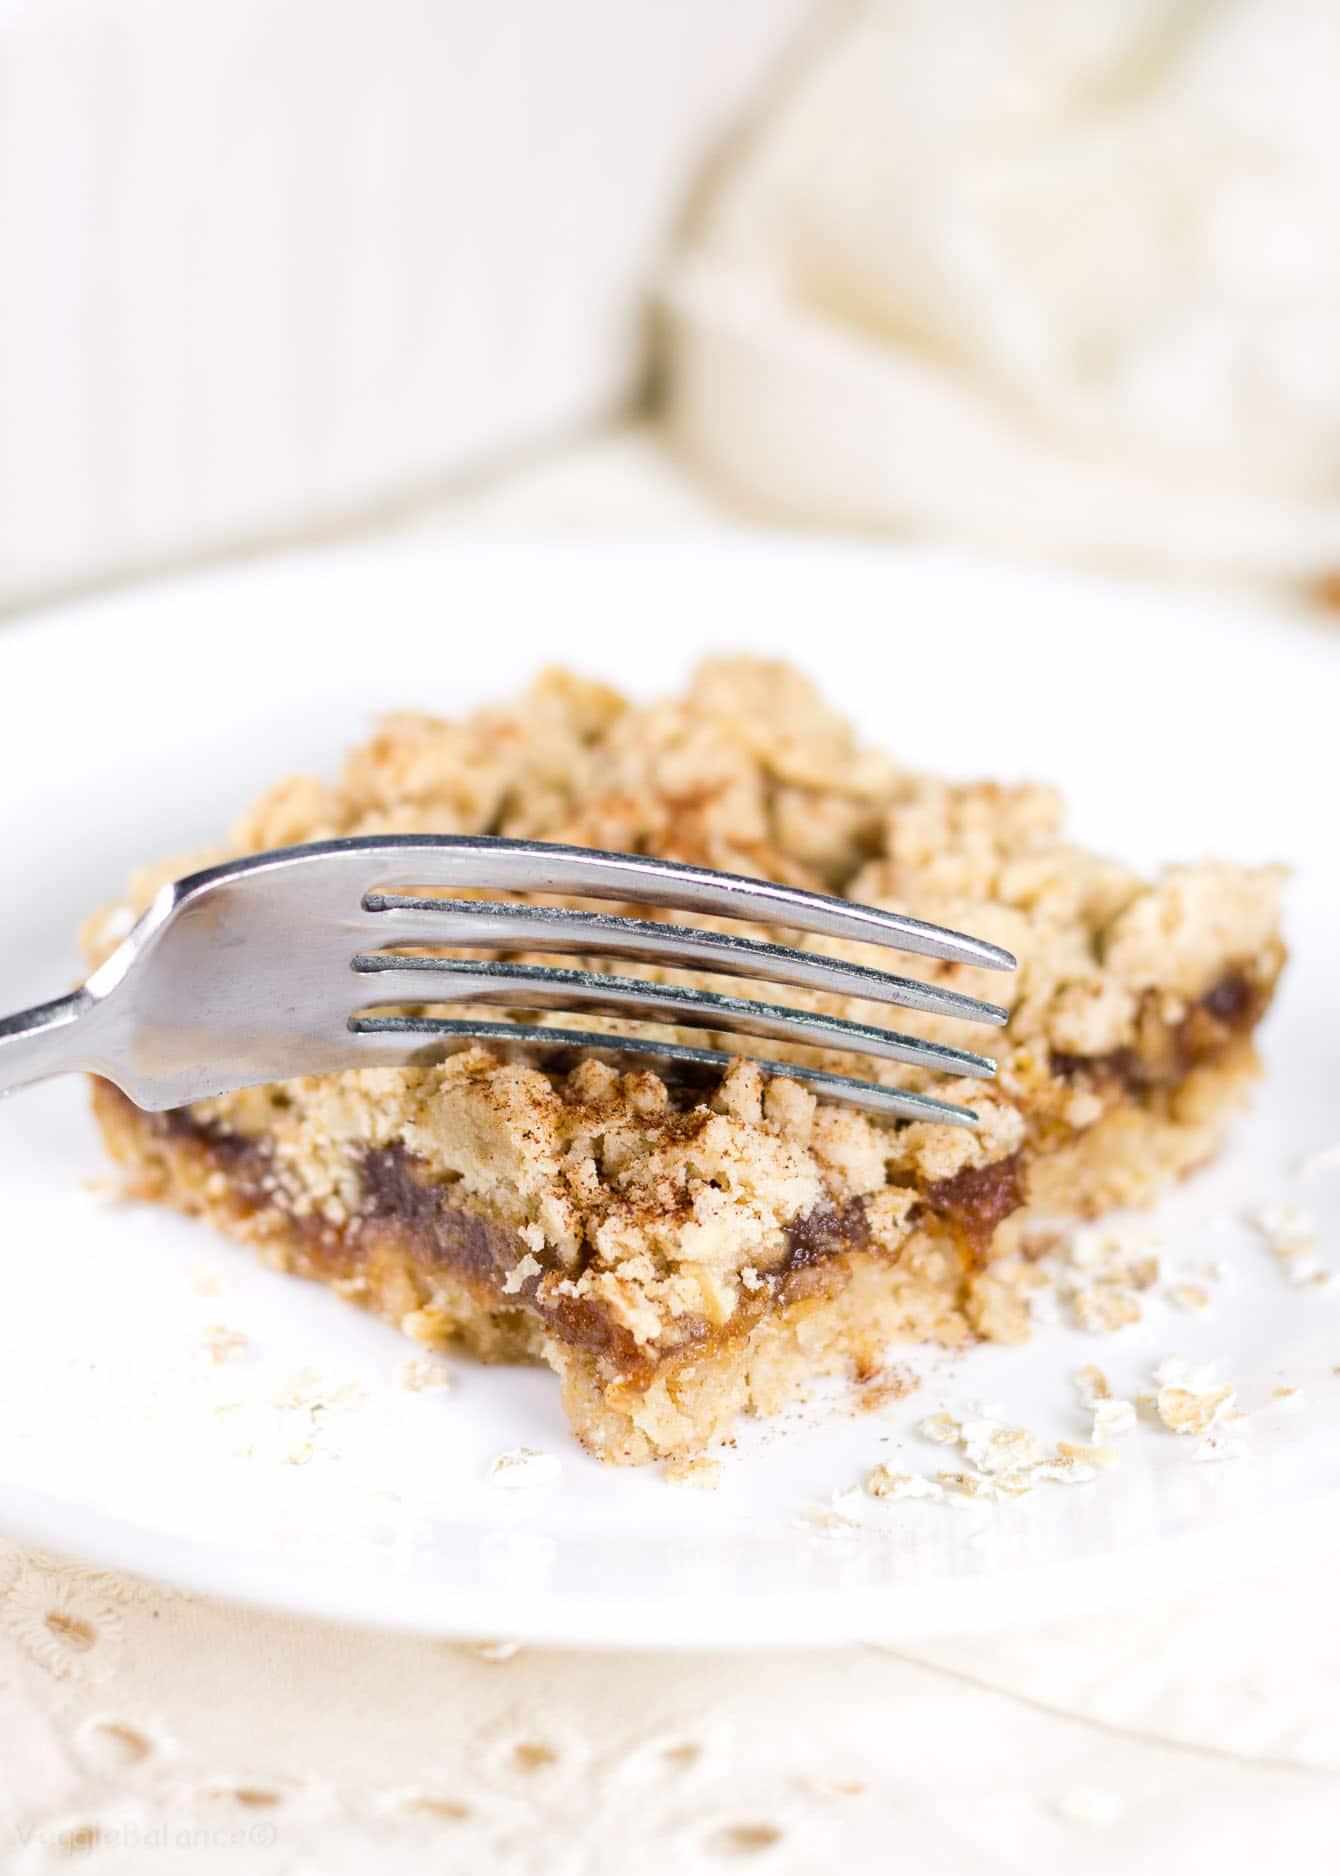 Apple Oatmeal Bars recipe